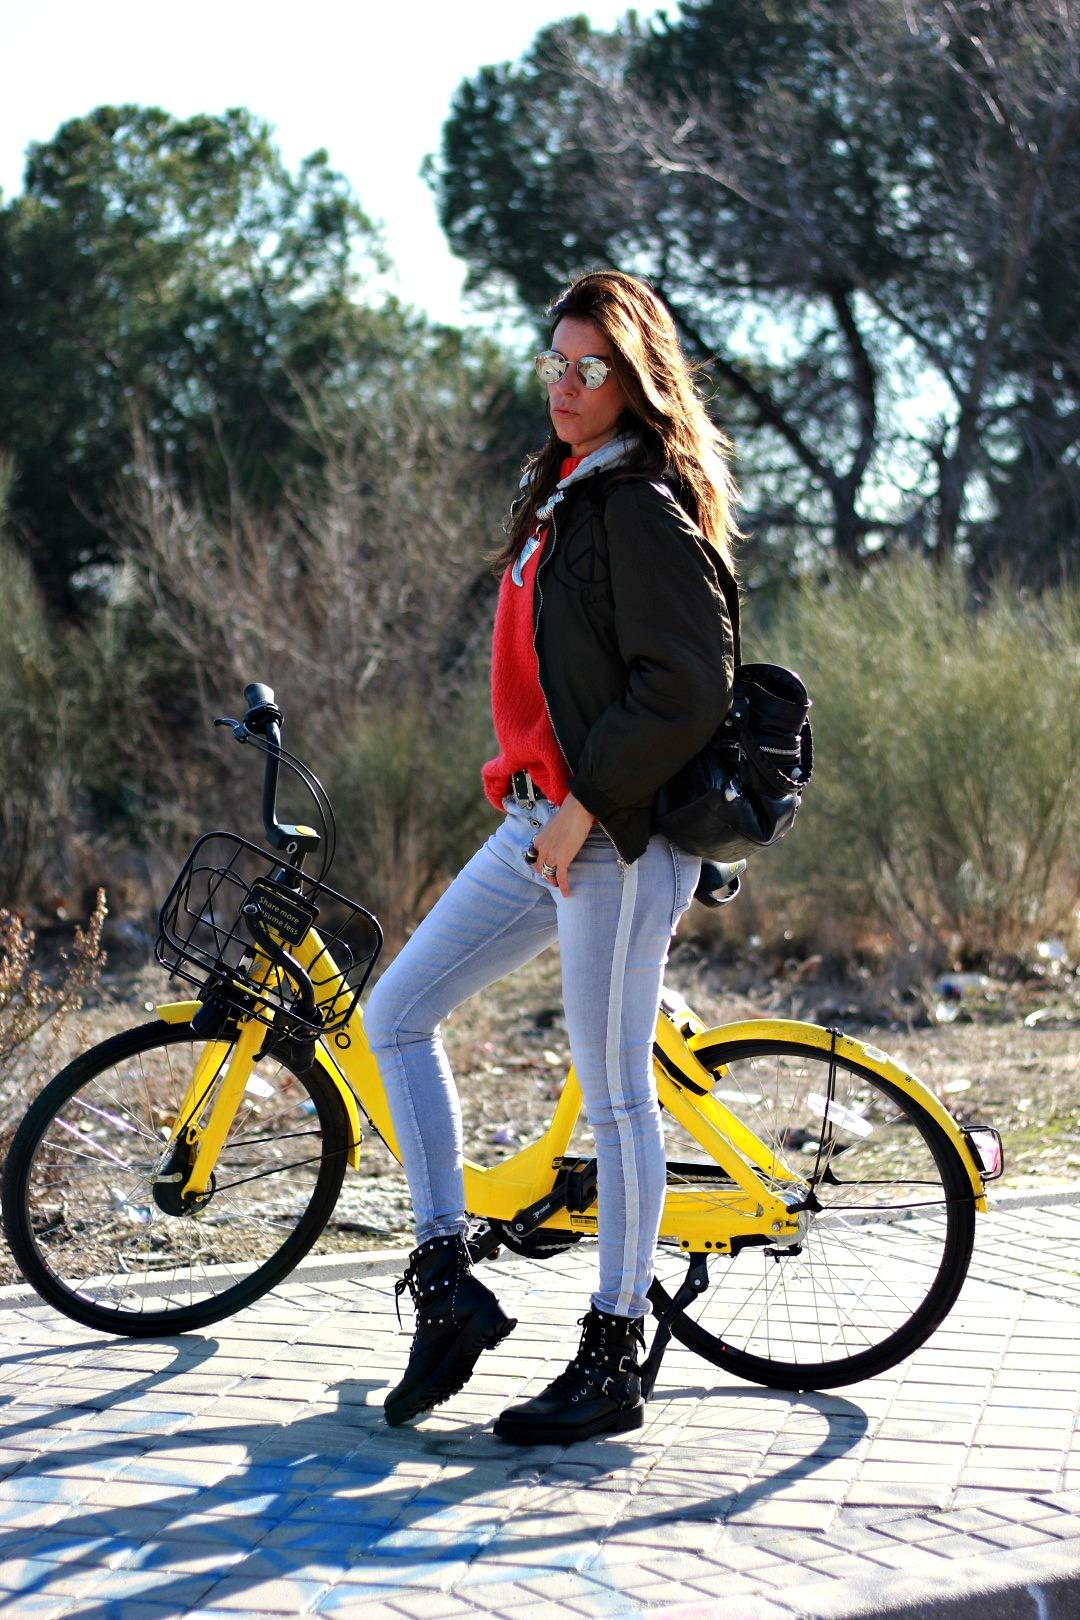 llévame en tu bicicleta-70118-mytenida